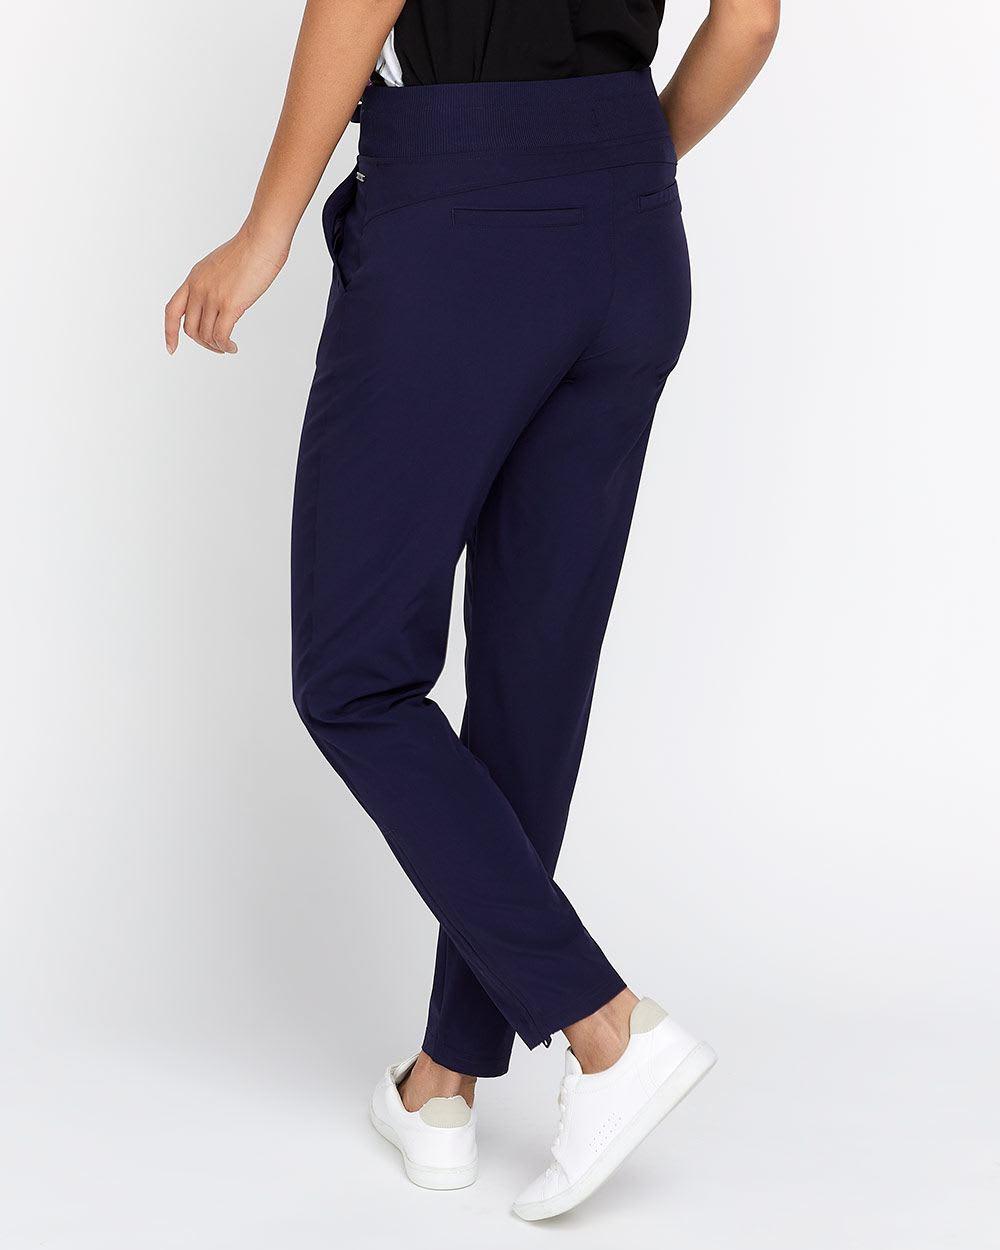 Hyba Adjustable Pants